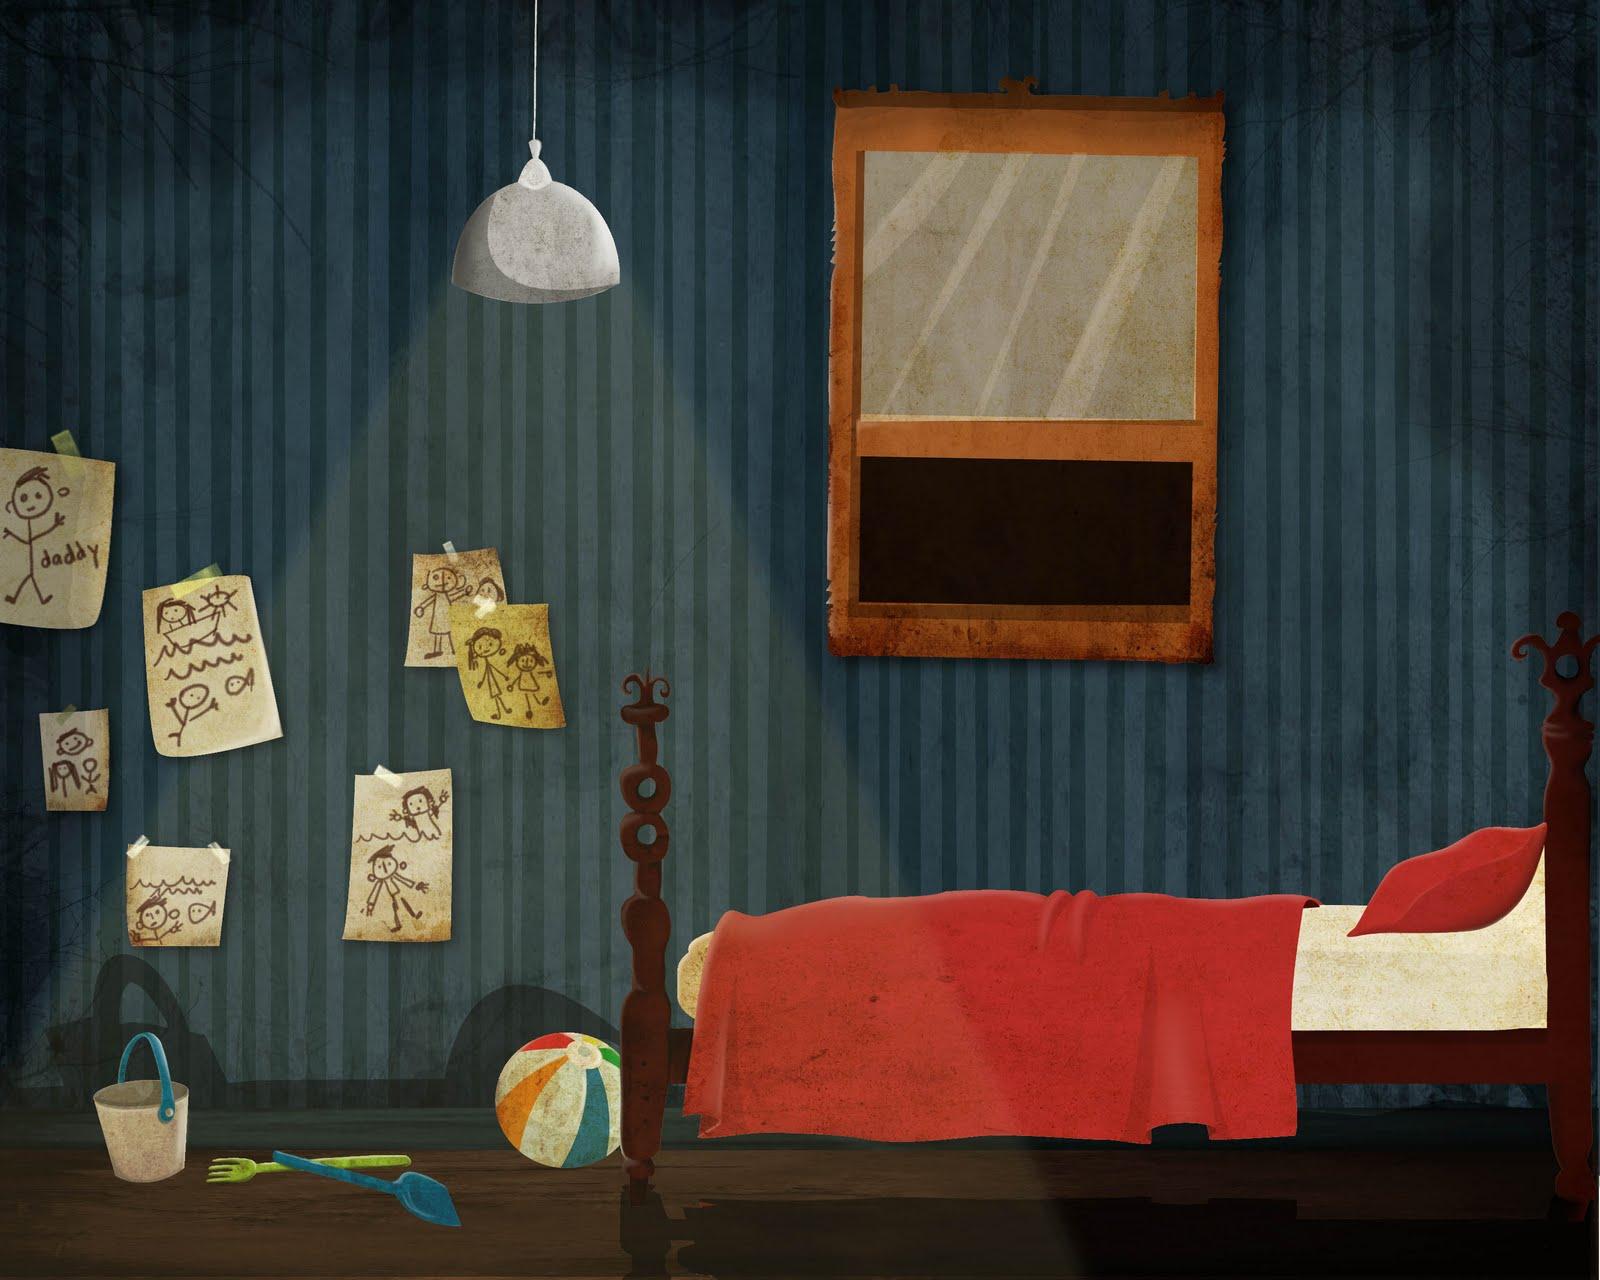 http://2.bp.blogspot.com/-QEbCXBxmVAY/TZL_0wx2jxI/AAAAAAAAARM/mPj2L8RudmE/s1600/bedroom%2Bthing.jpg